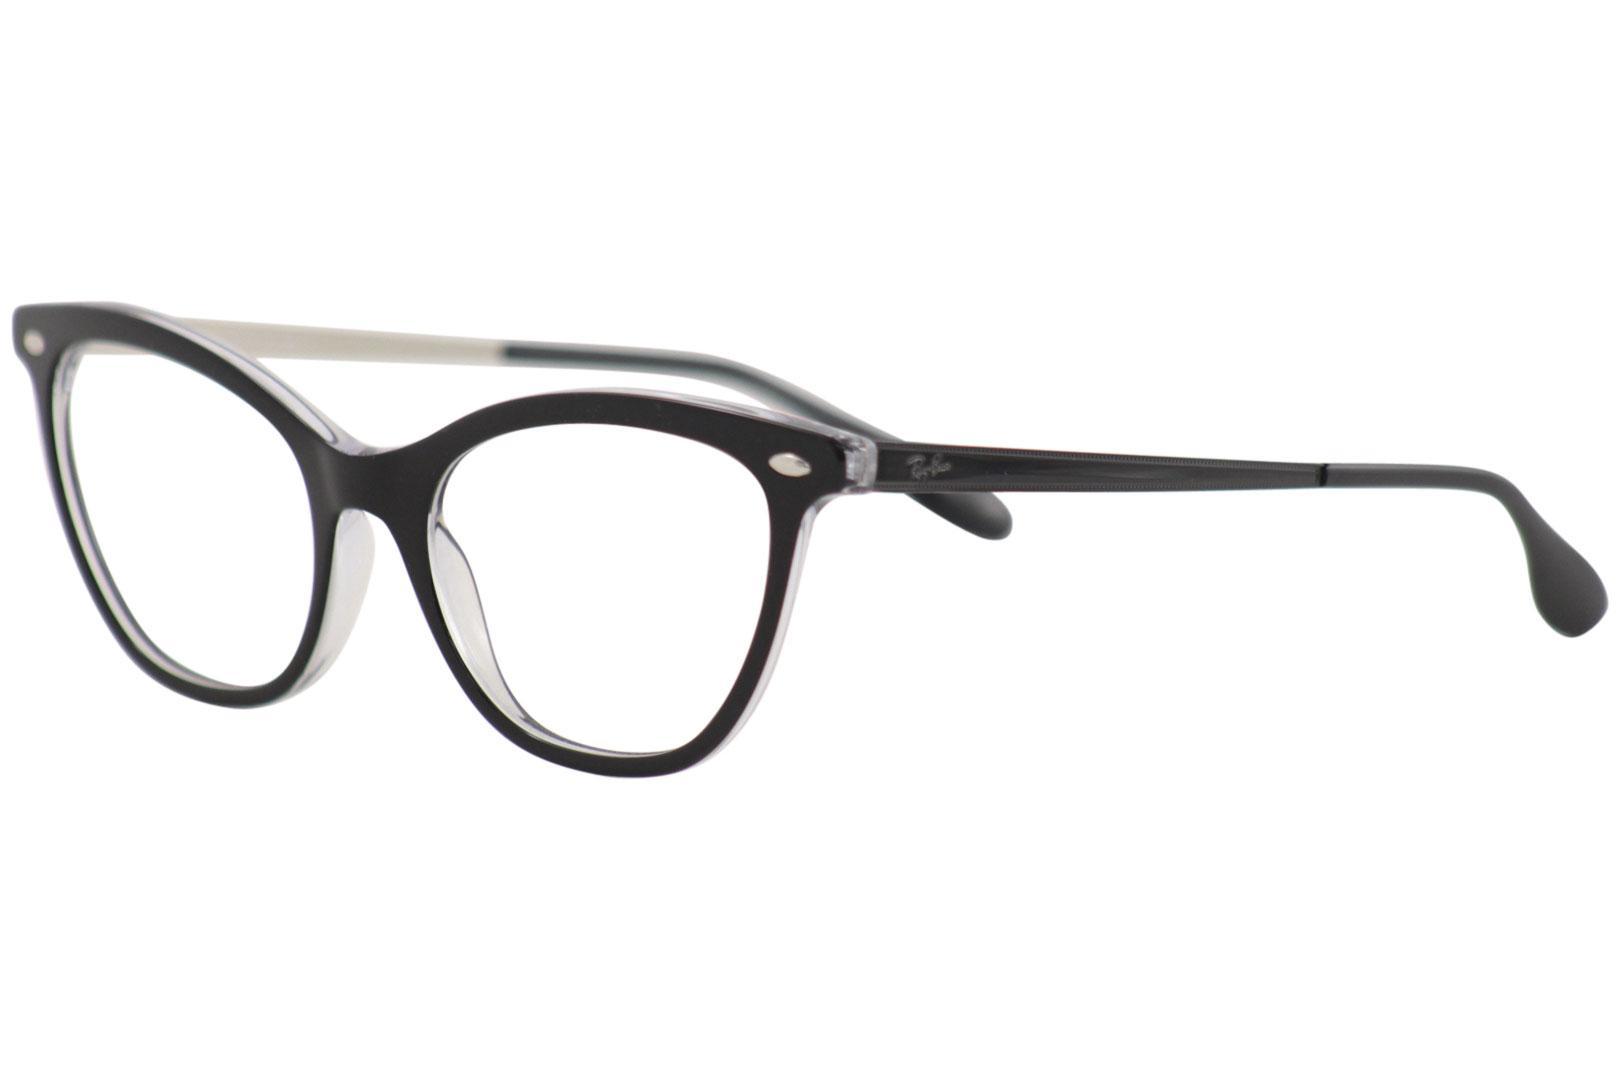 4eaf81d6067 Ray Ban Women s Eyeglasses RB5360 RX 5360 Full Rim RayBan Optical Frame